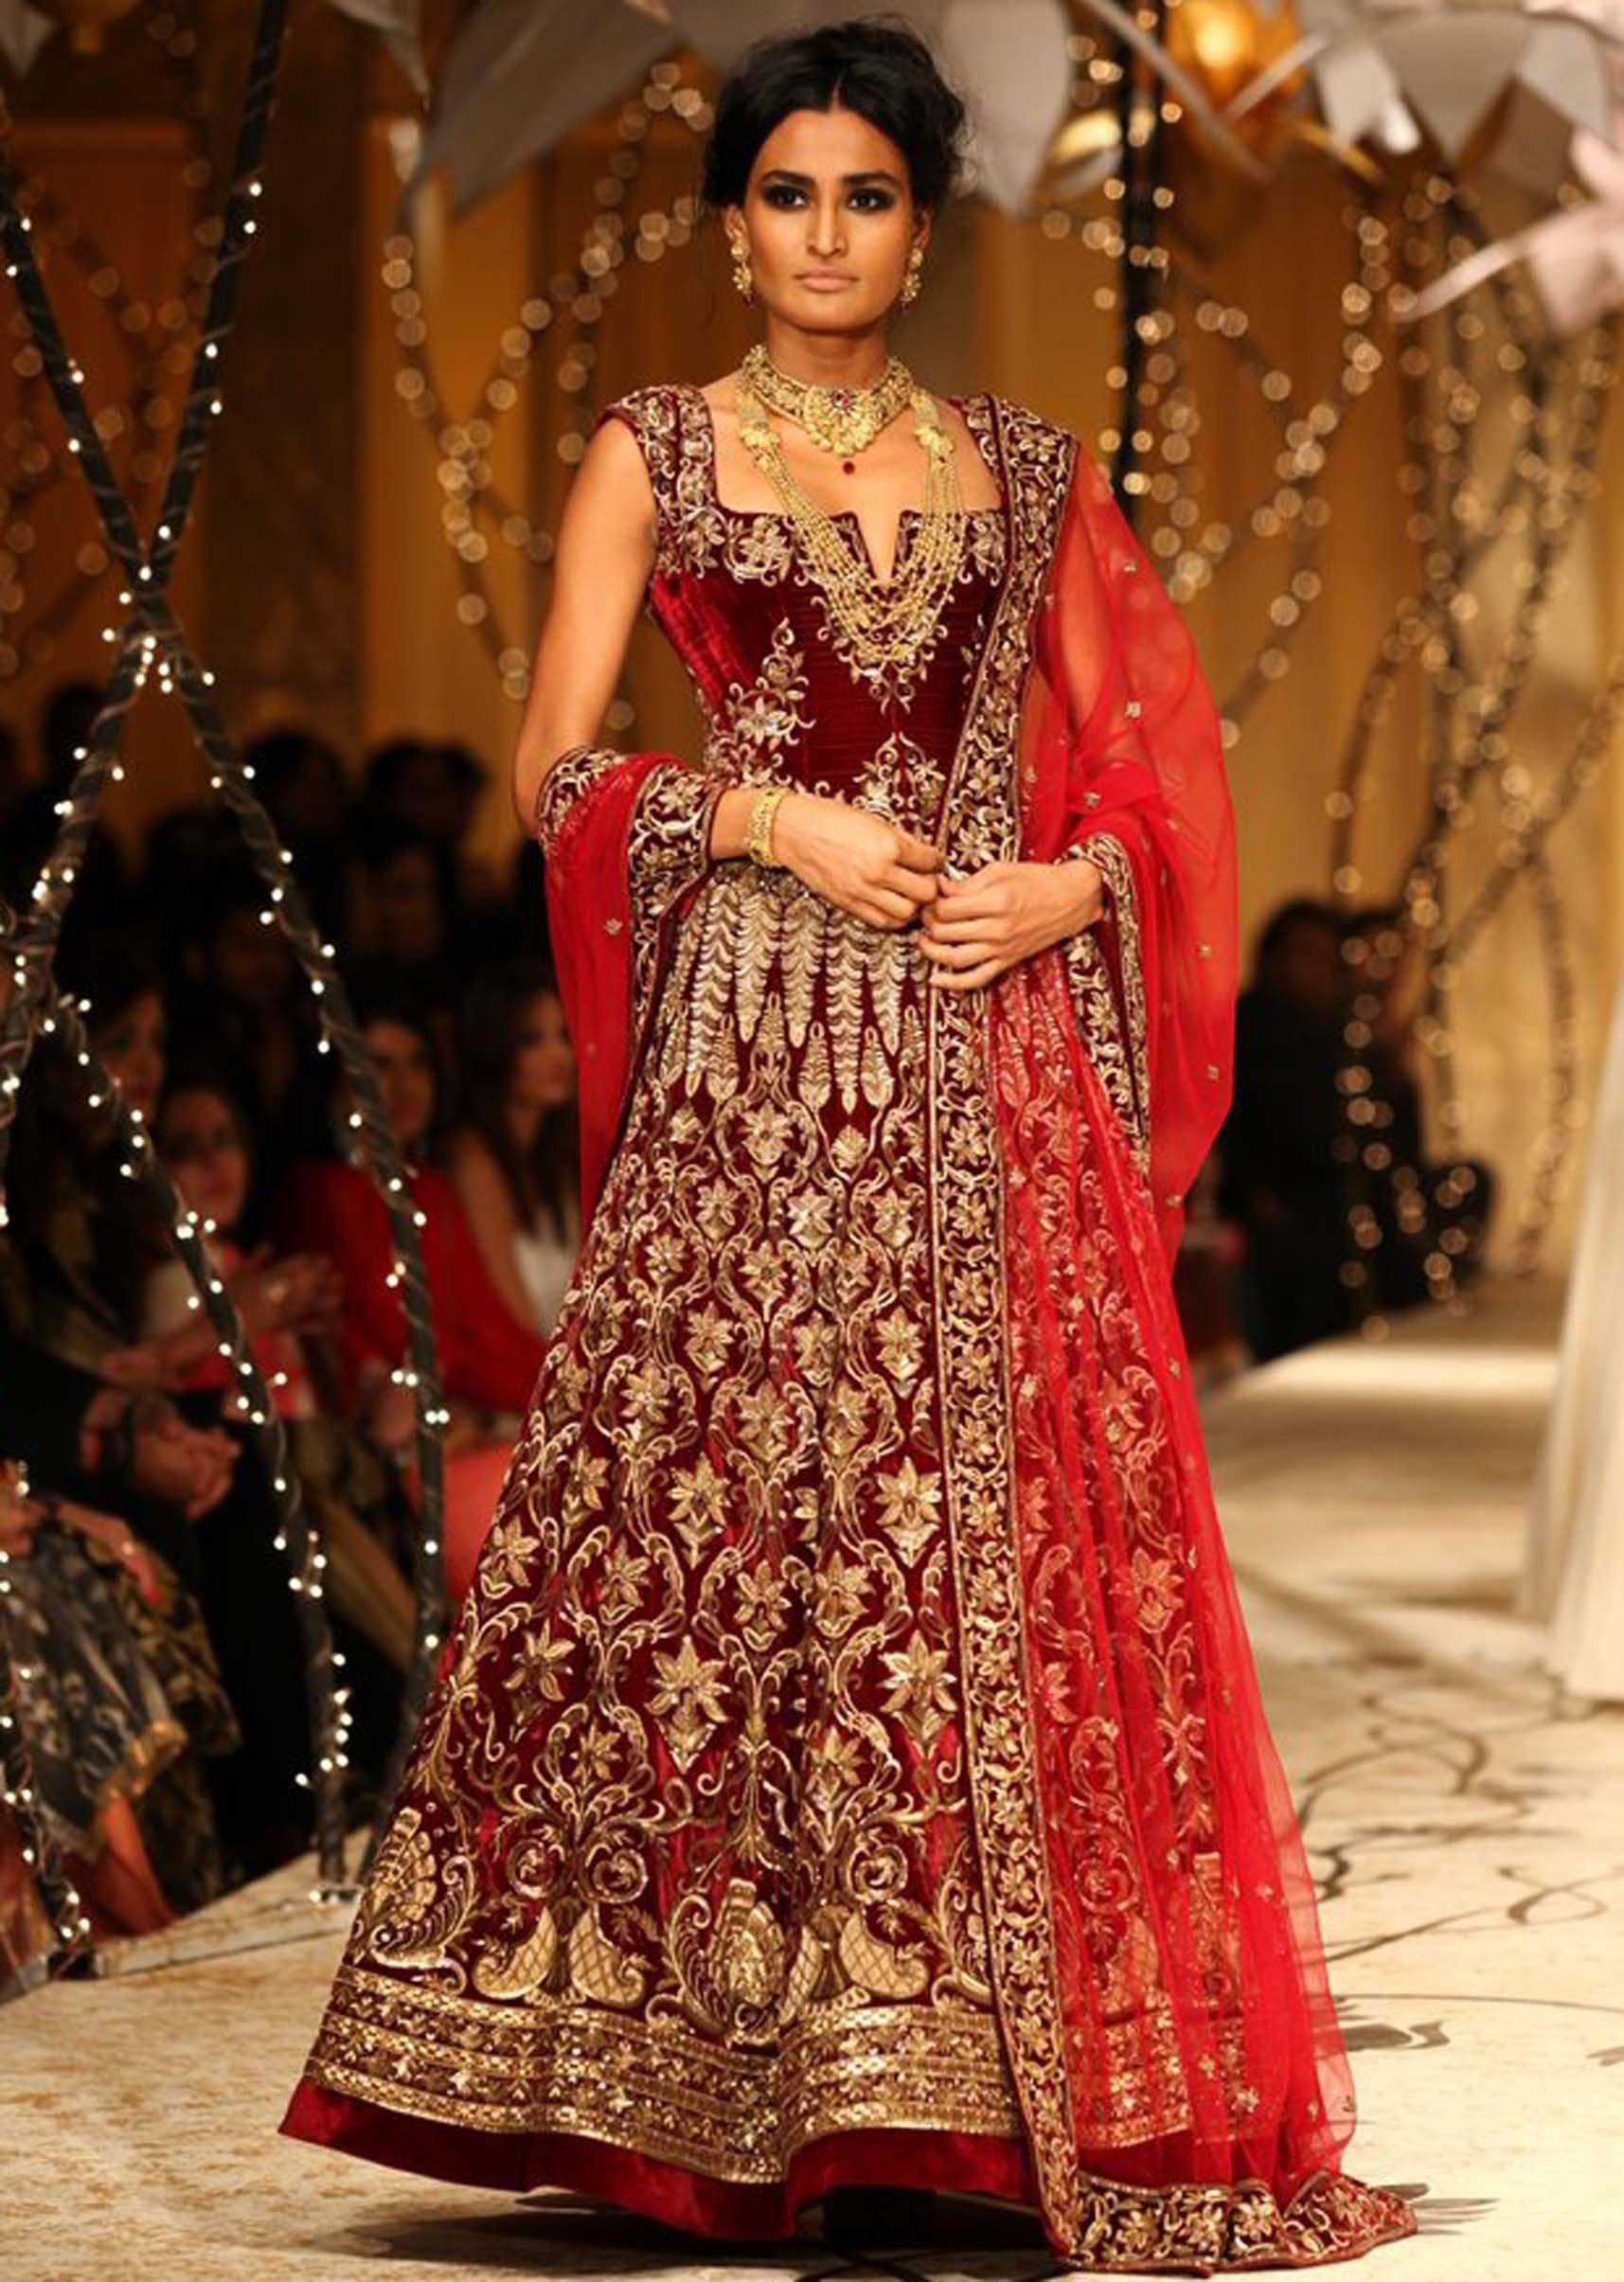 models showcasing rohit bal's fabulous bridal and groom